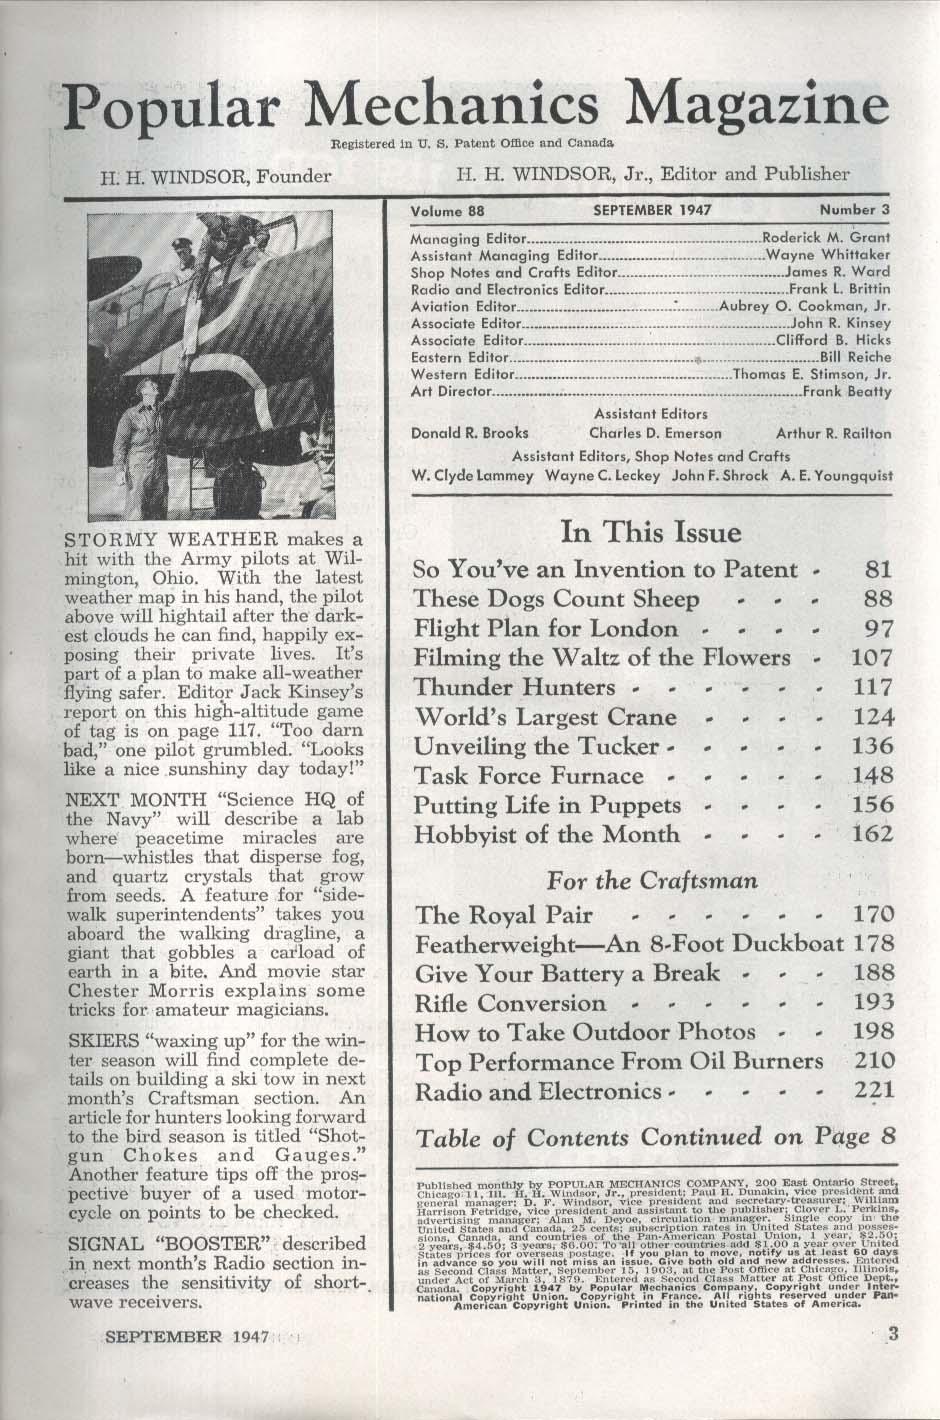 POPULAR MECHANICS Patenting Inventions London Flight Plan Thunder Hunters 9 1947